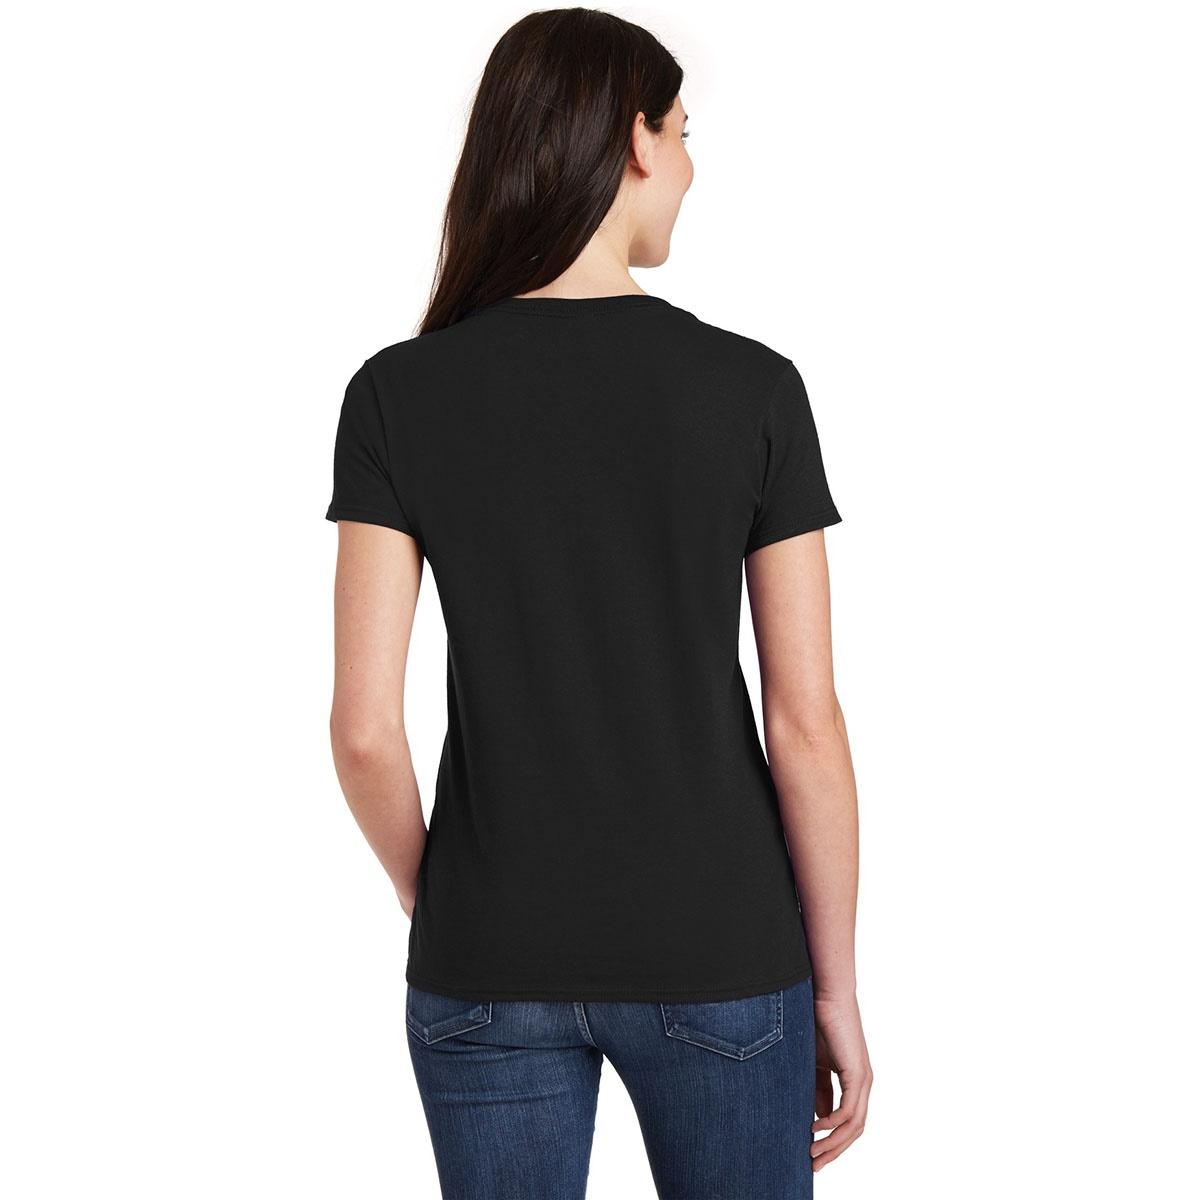 Gildan 5v00l ladies heavy cotton v neck t shirt black for V neck black t shirt women s